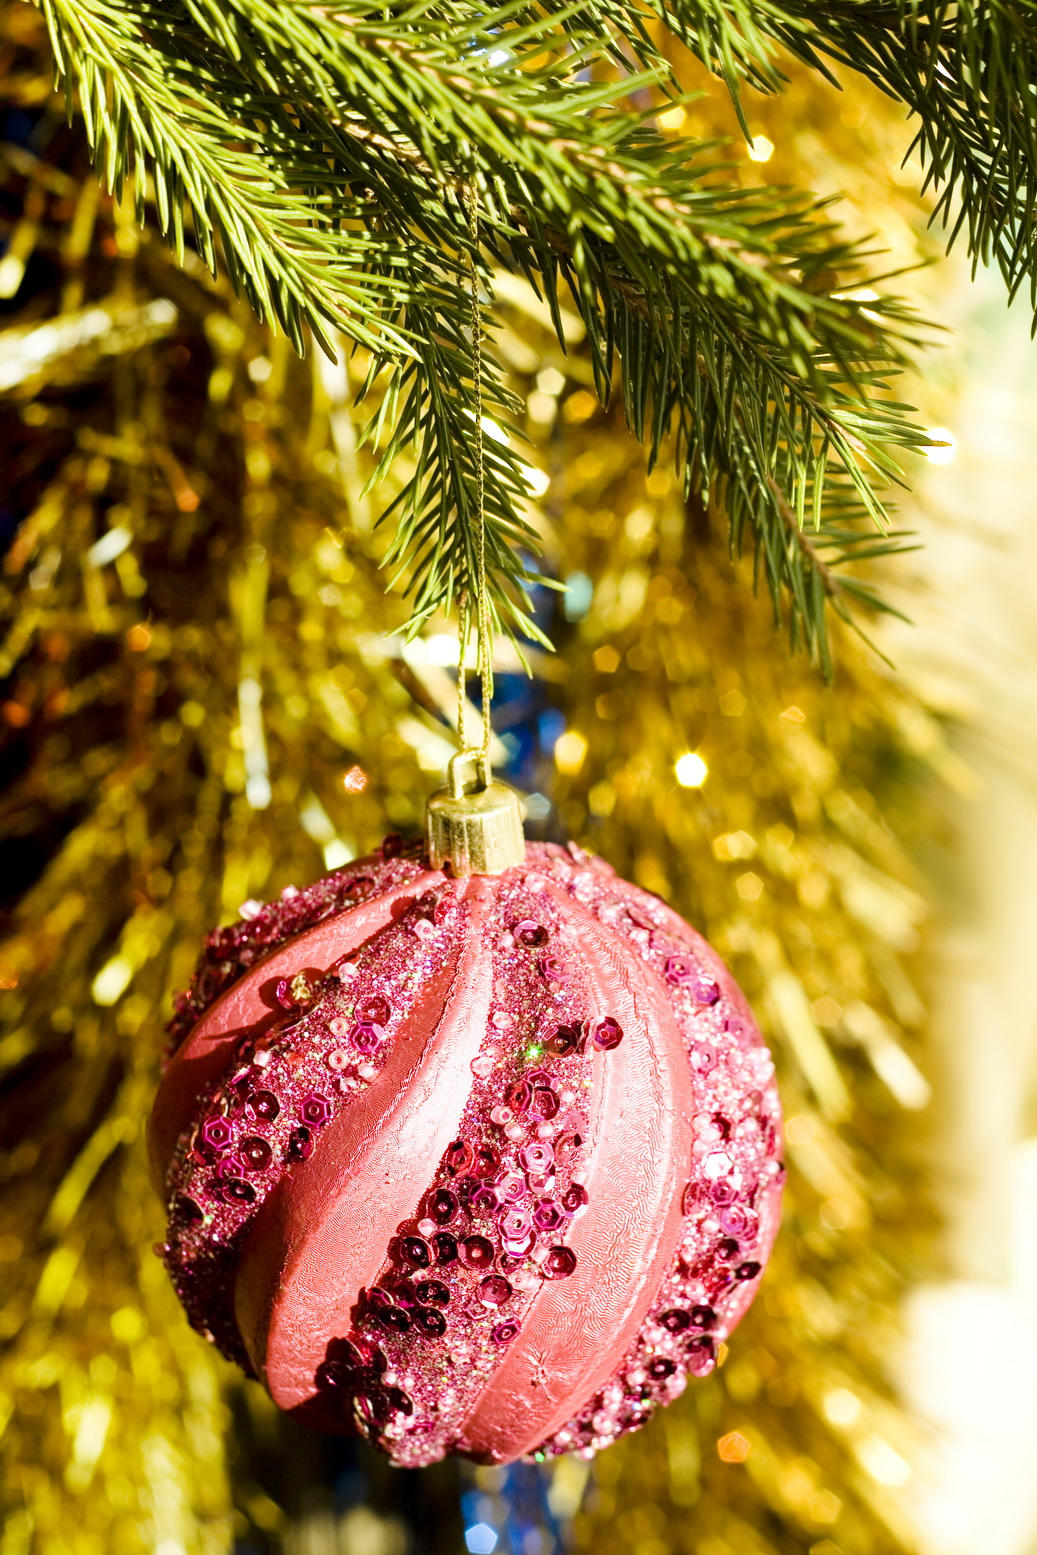 christmas bauble, Ball, Gold, Vibrant, Tree, HQ Photo